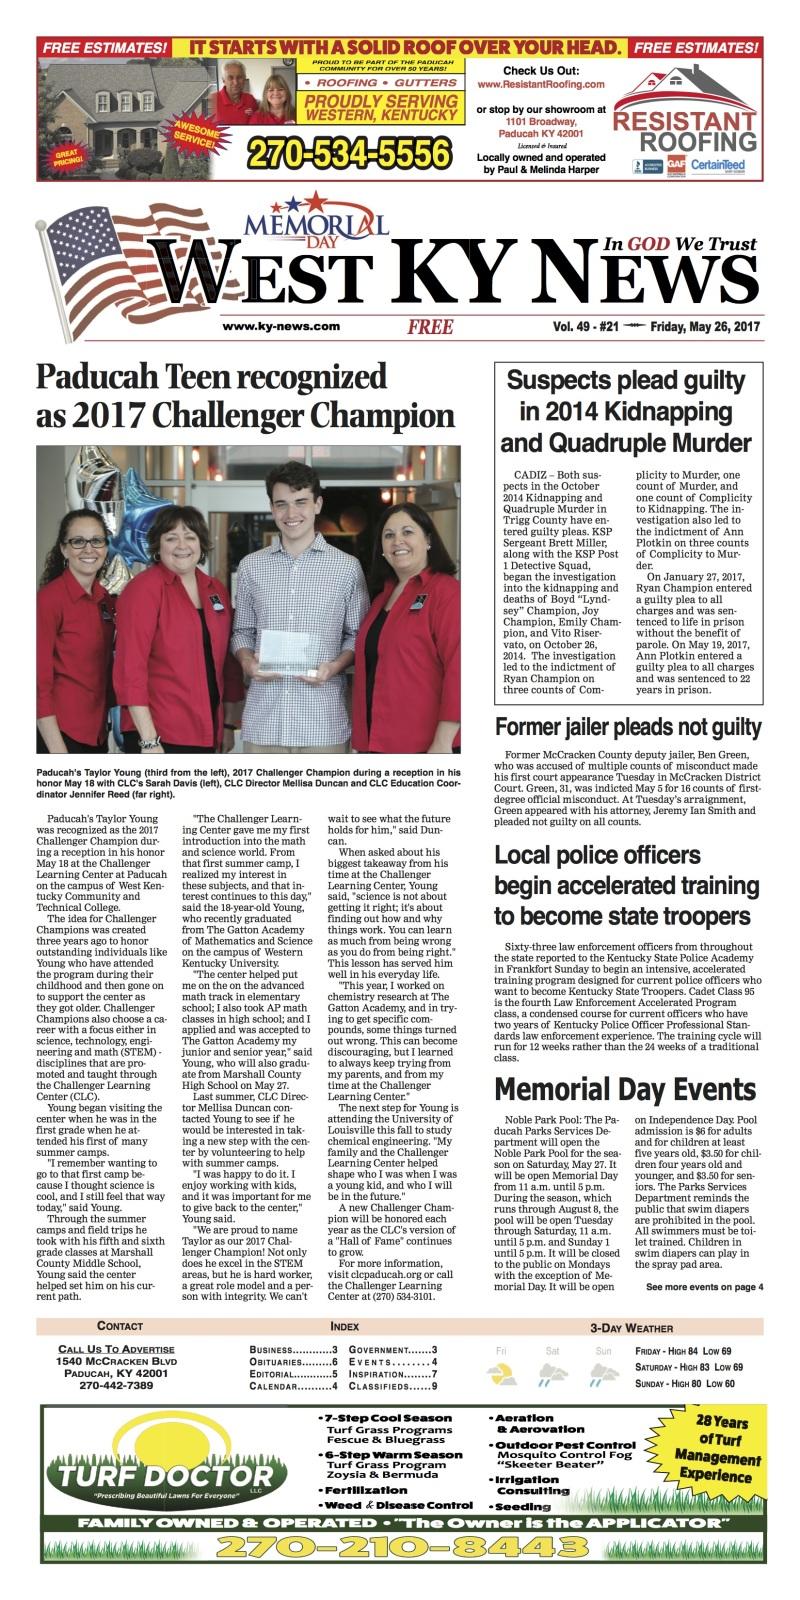 West Ky News 5-26-17